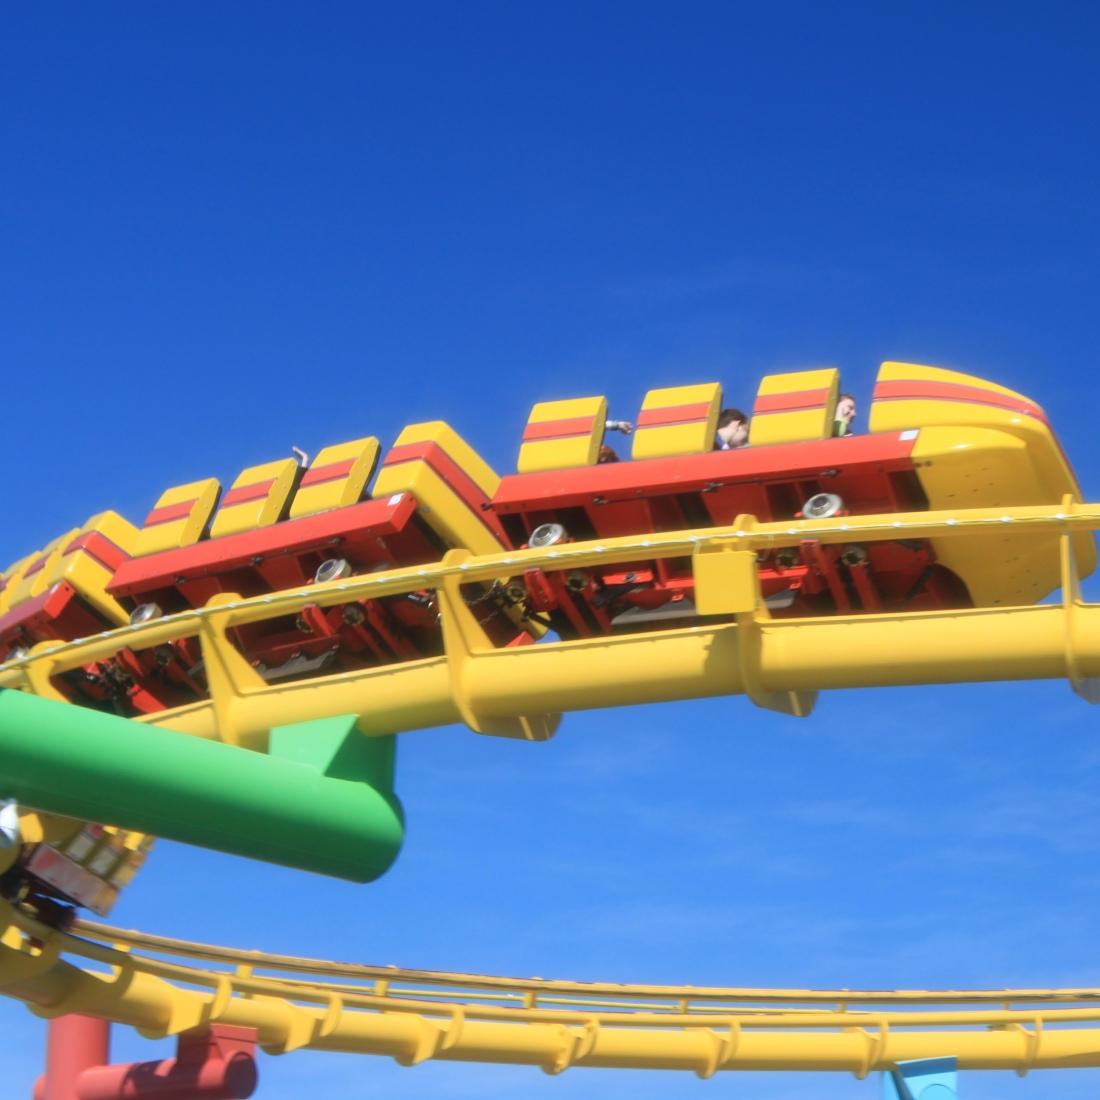 Roller Coaster at Pacific Park by Jez Braithwaite